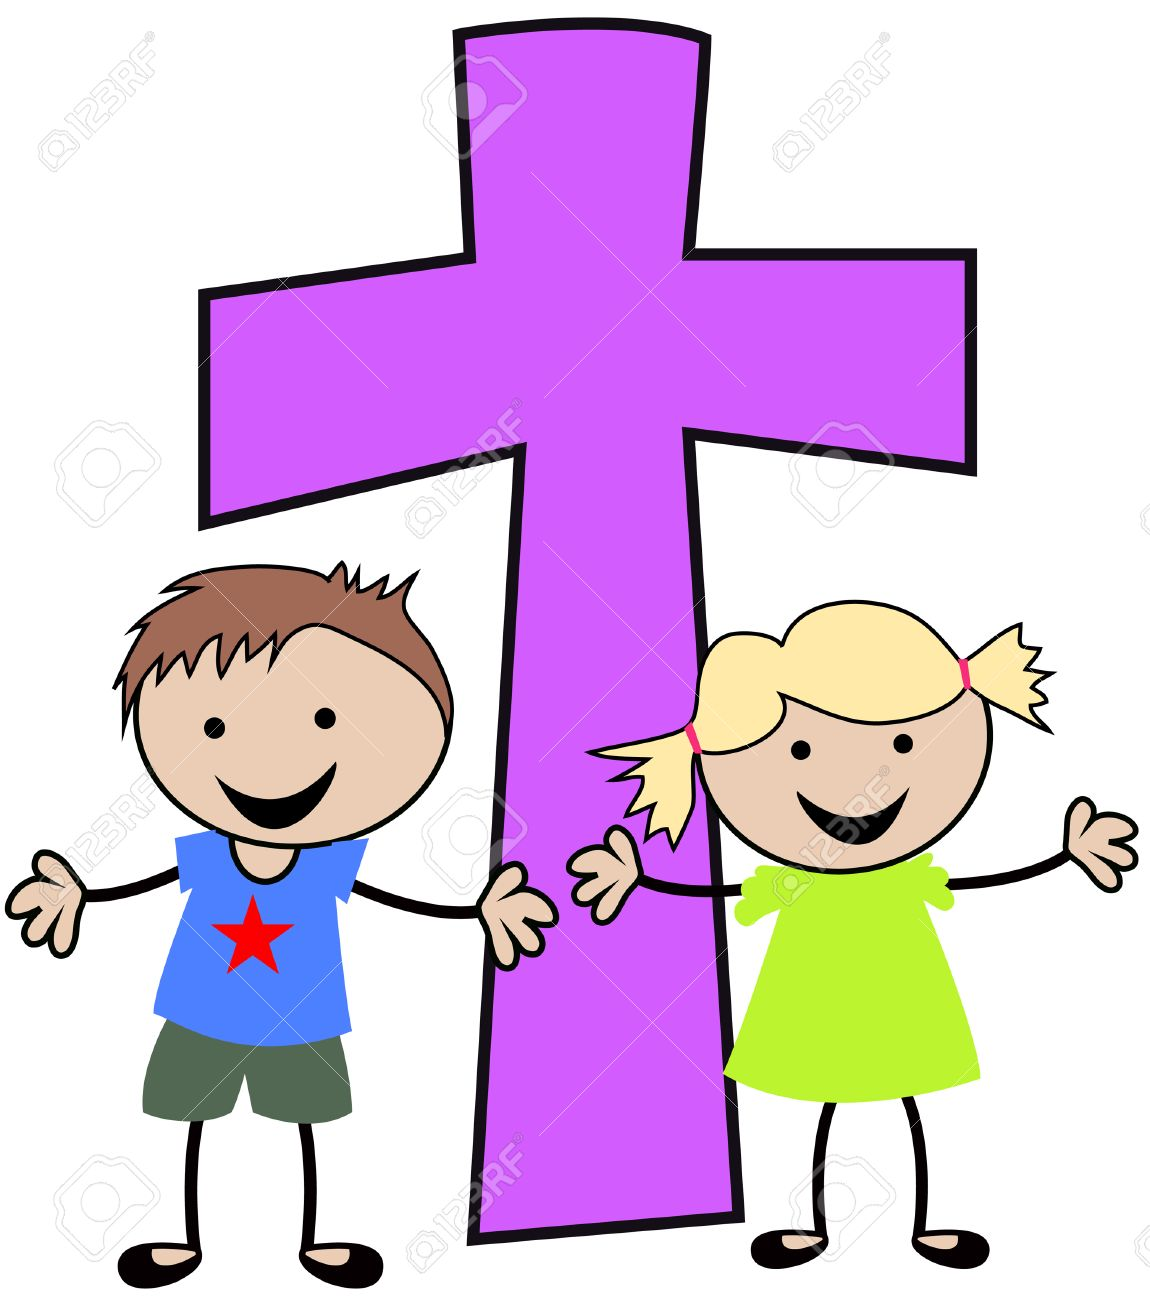 Kids Christian Clipart Boy & Free Clip Art Images #24406.